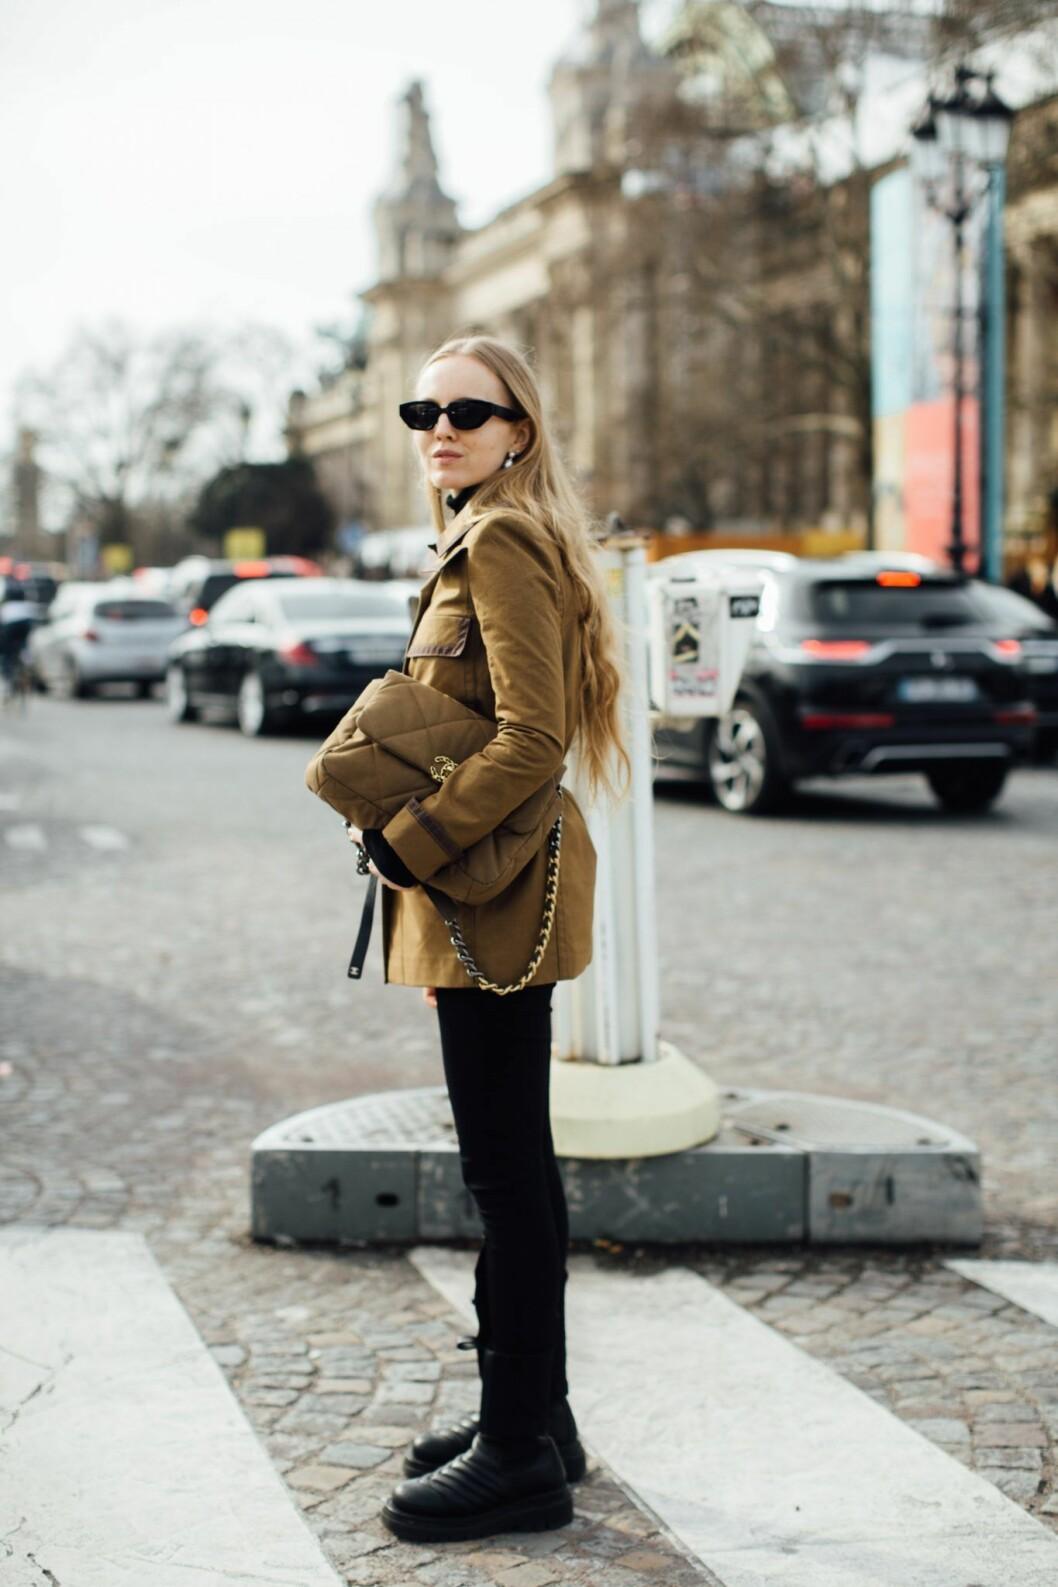 Alexandra Carl Chanels The Chanel 19